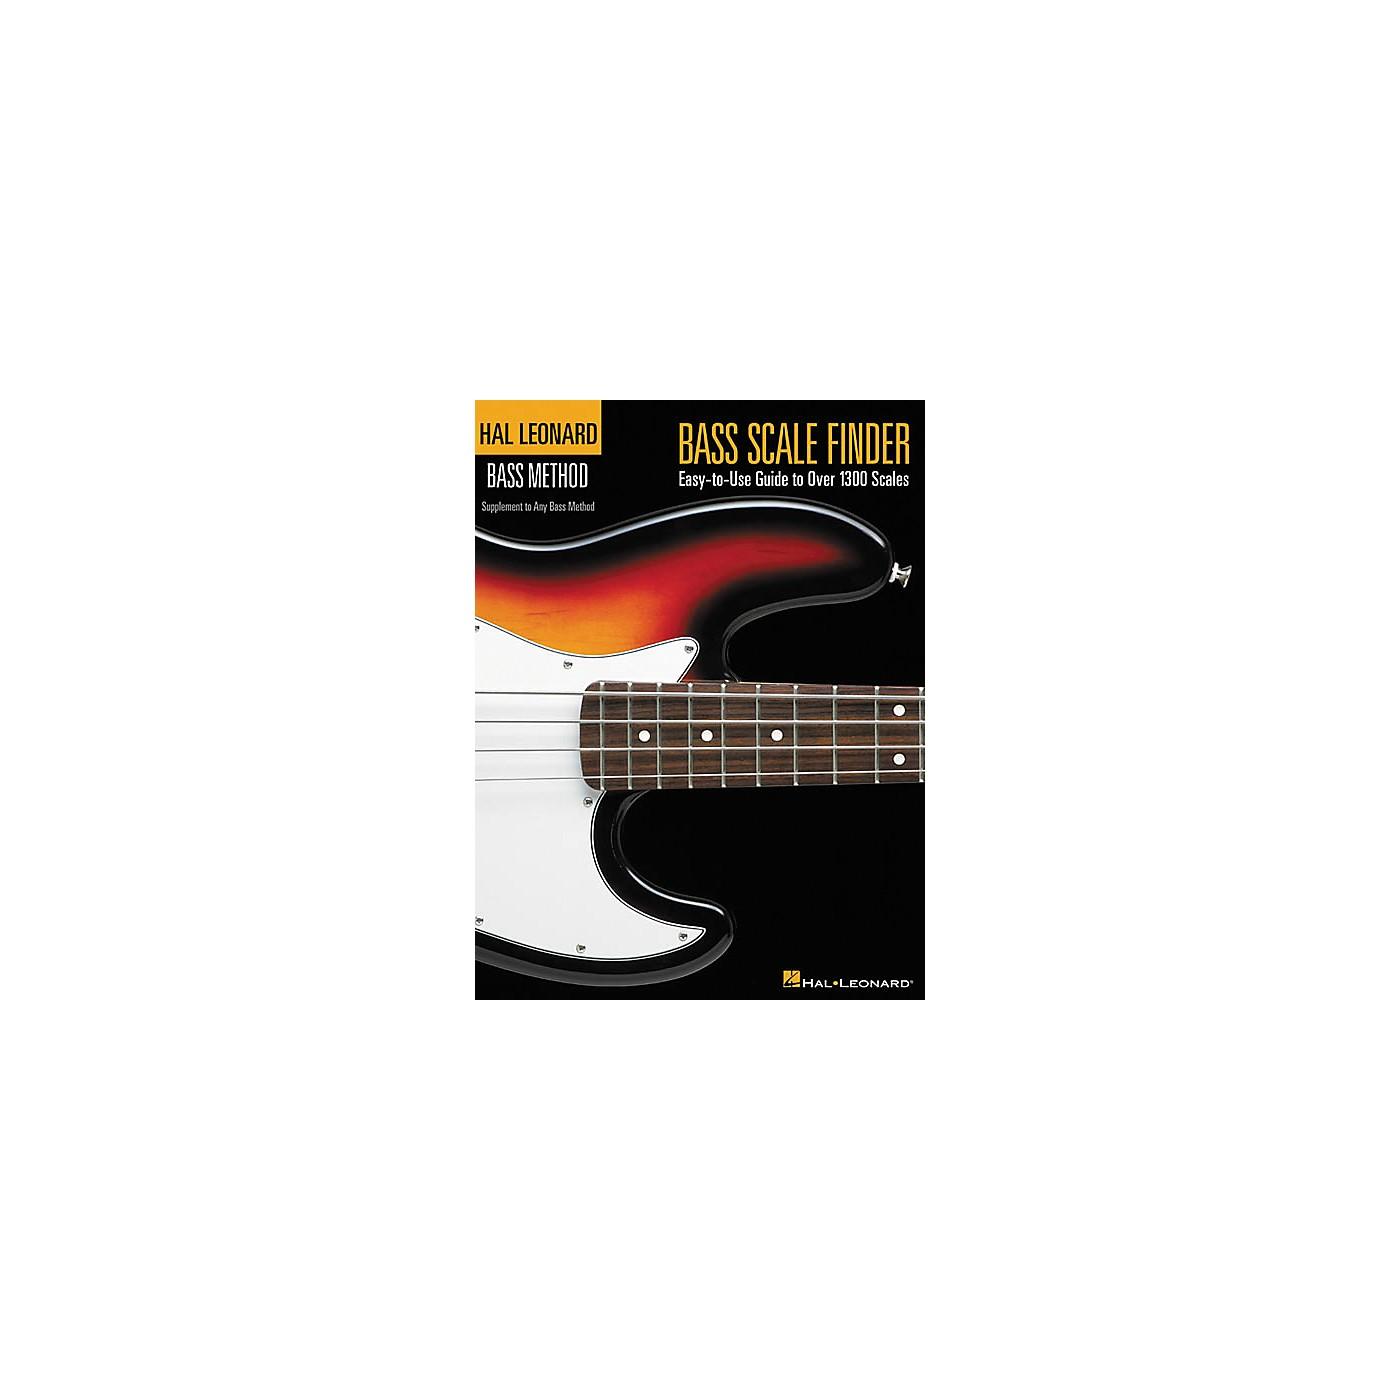 Hal Leonard Bass Scale Finder Book thumbnail